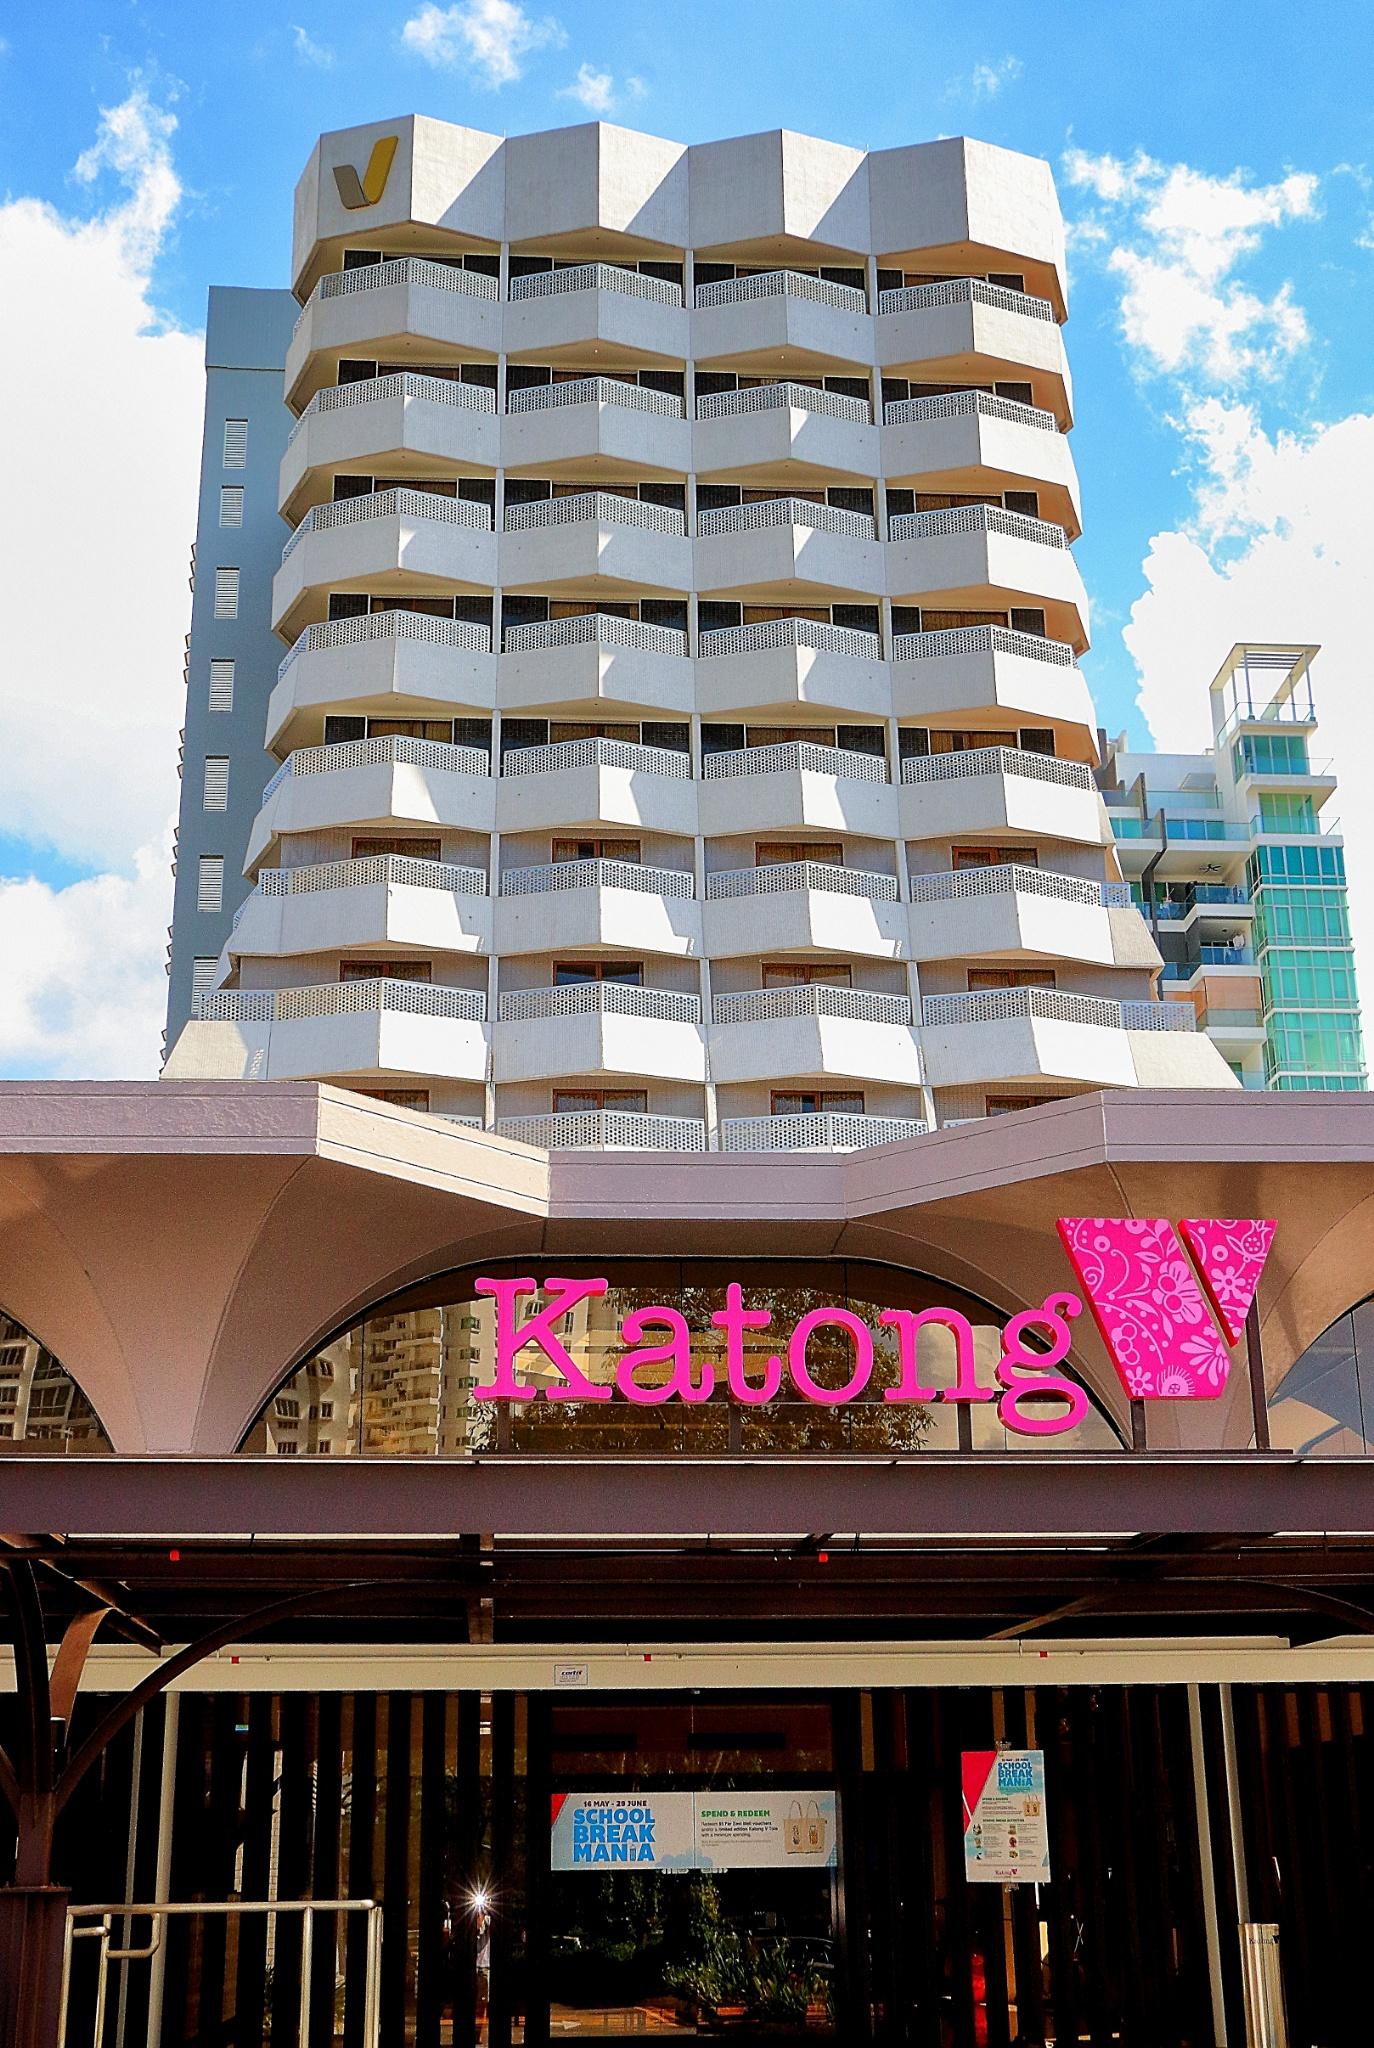 About Village Hotel Katong